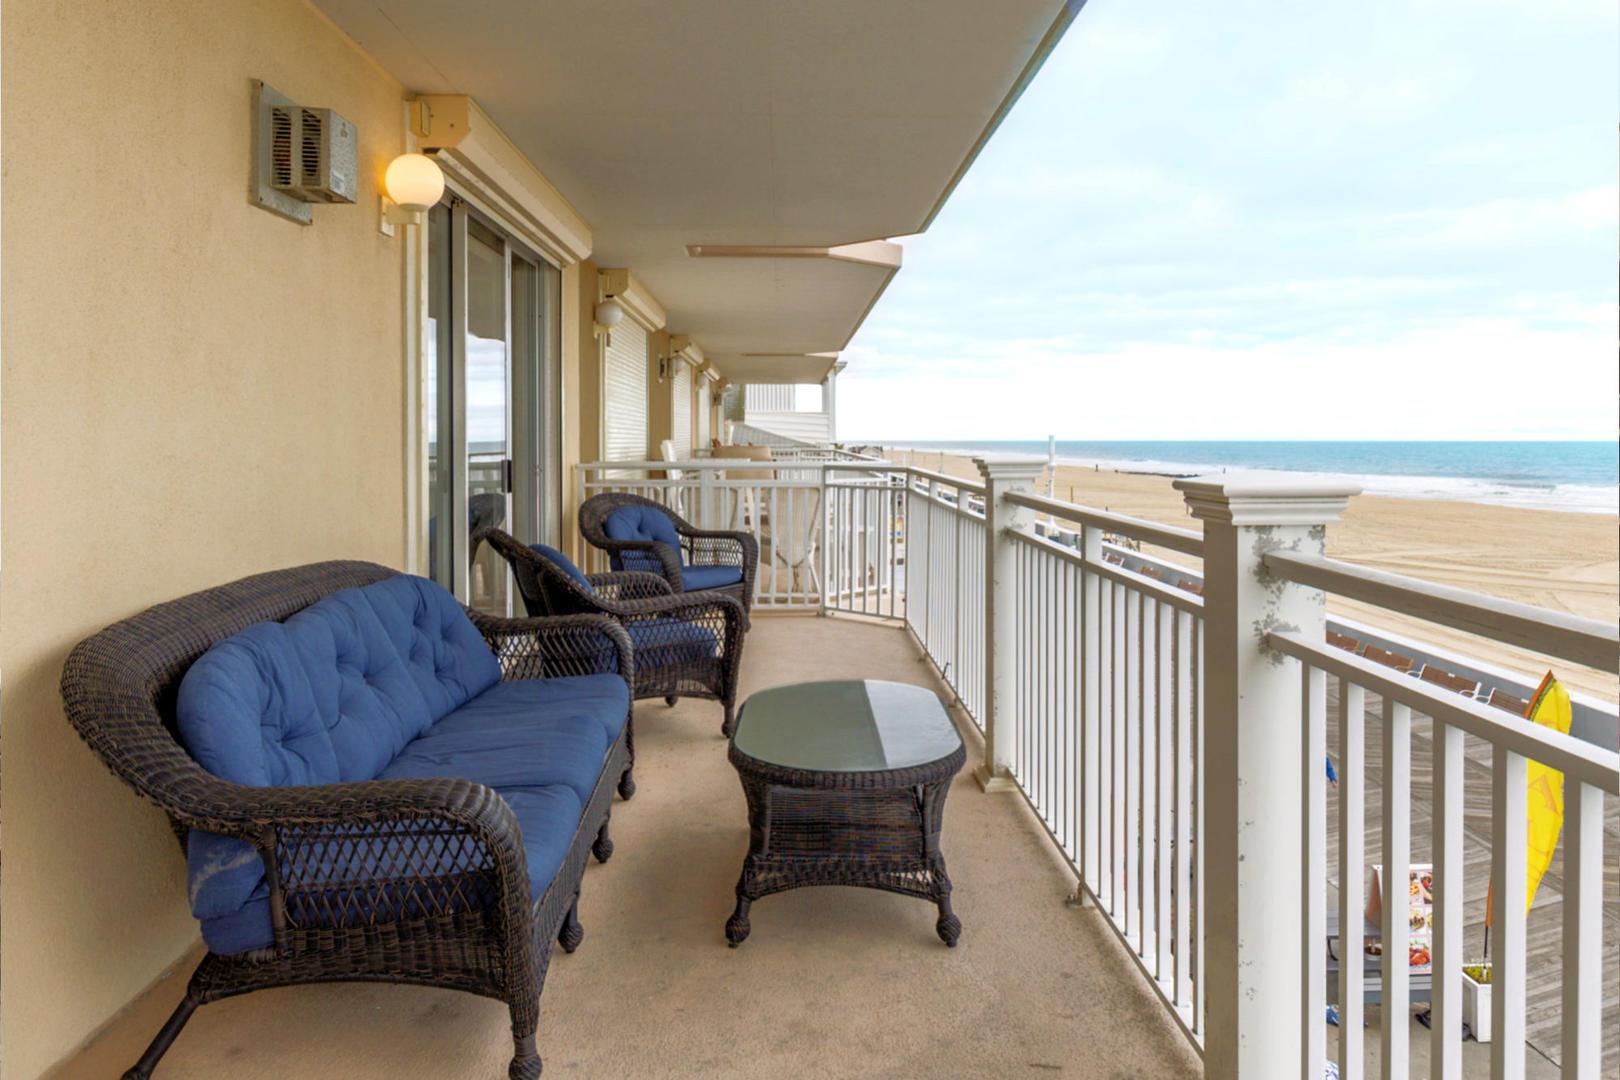 Oceans Mist 301 - Balcony